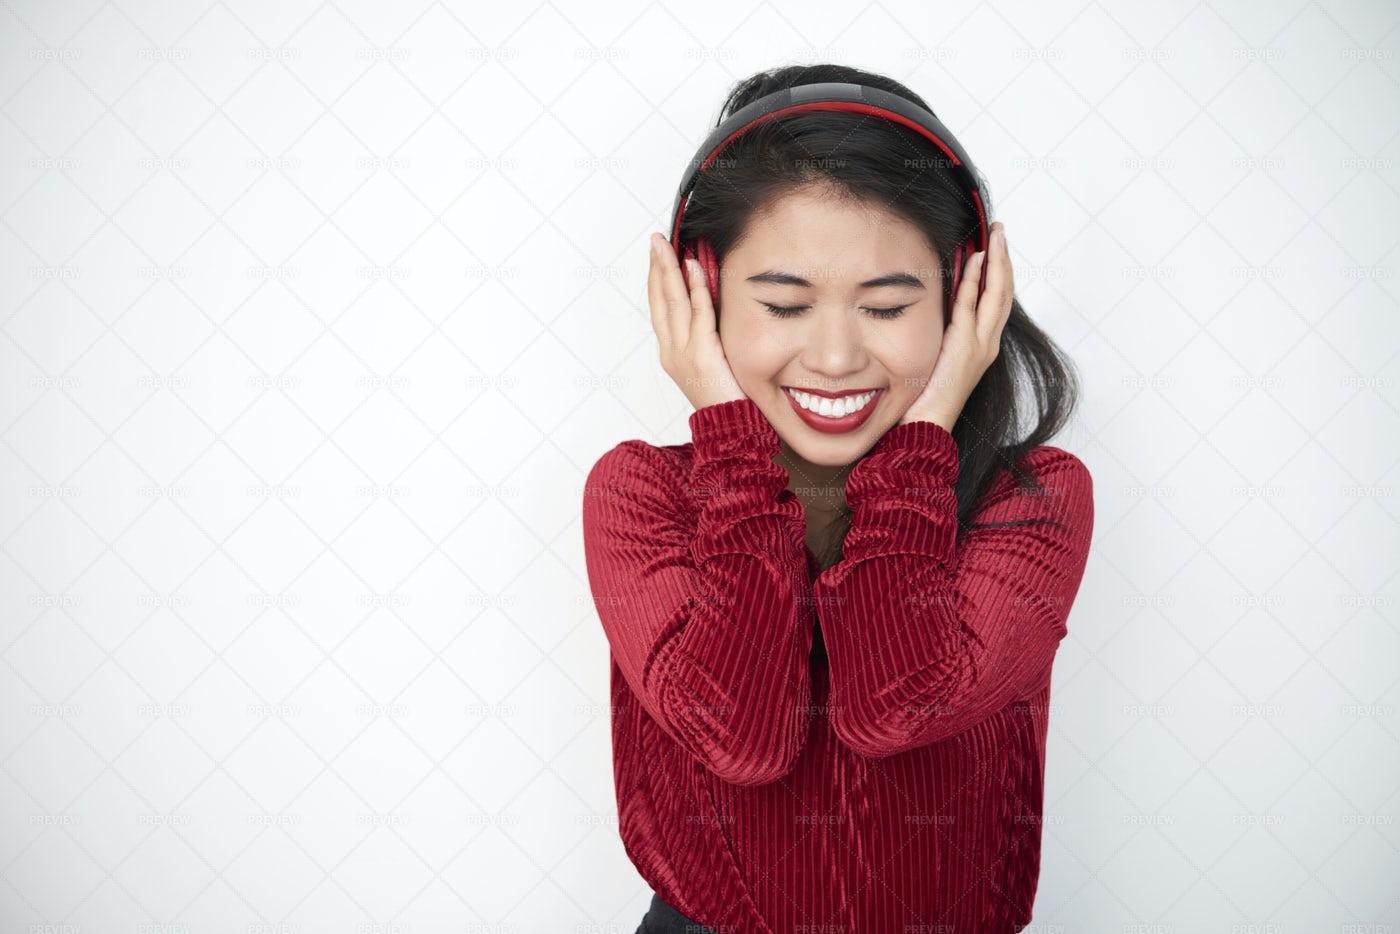 Woman Listening To Music: Stock Photos